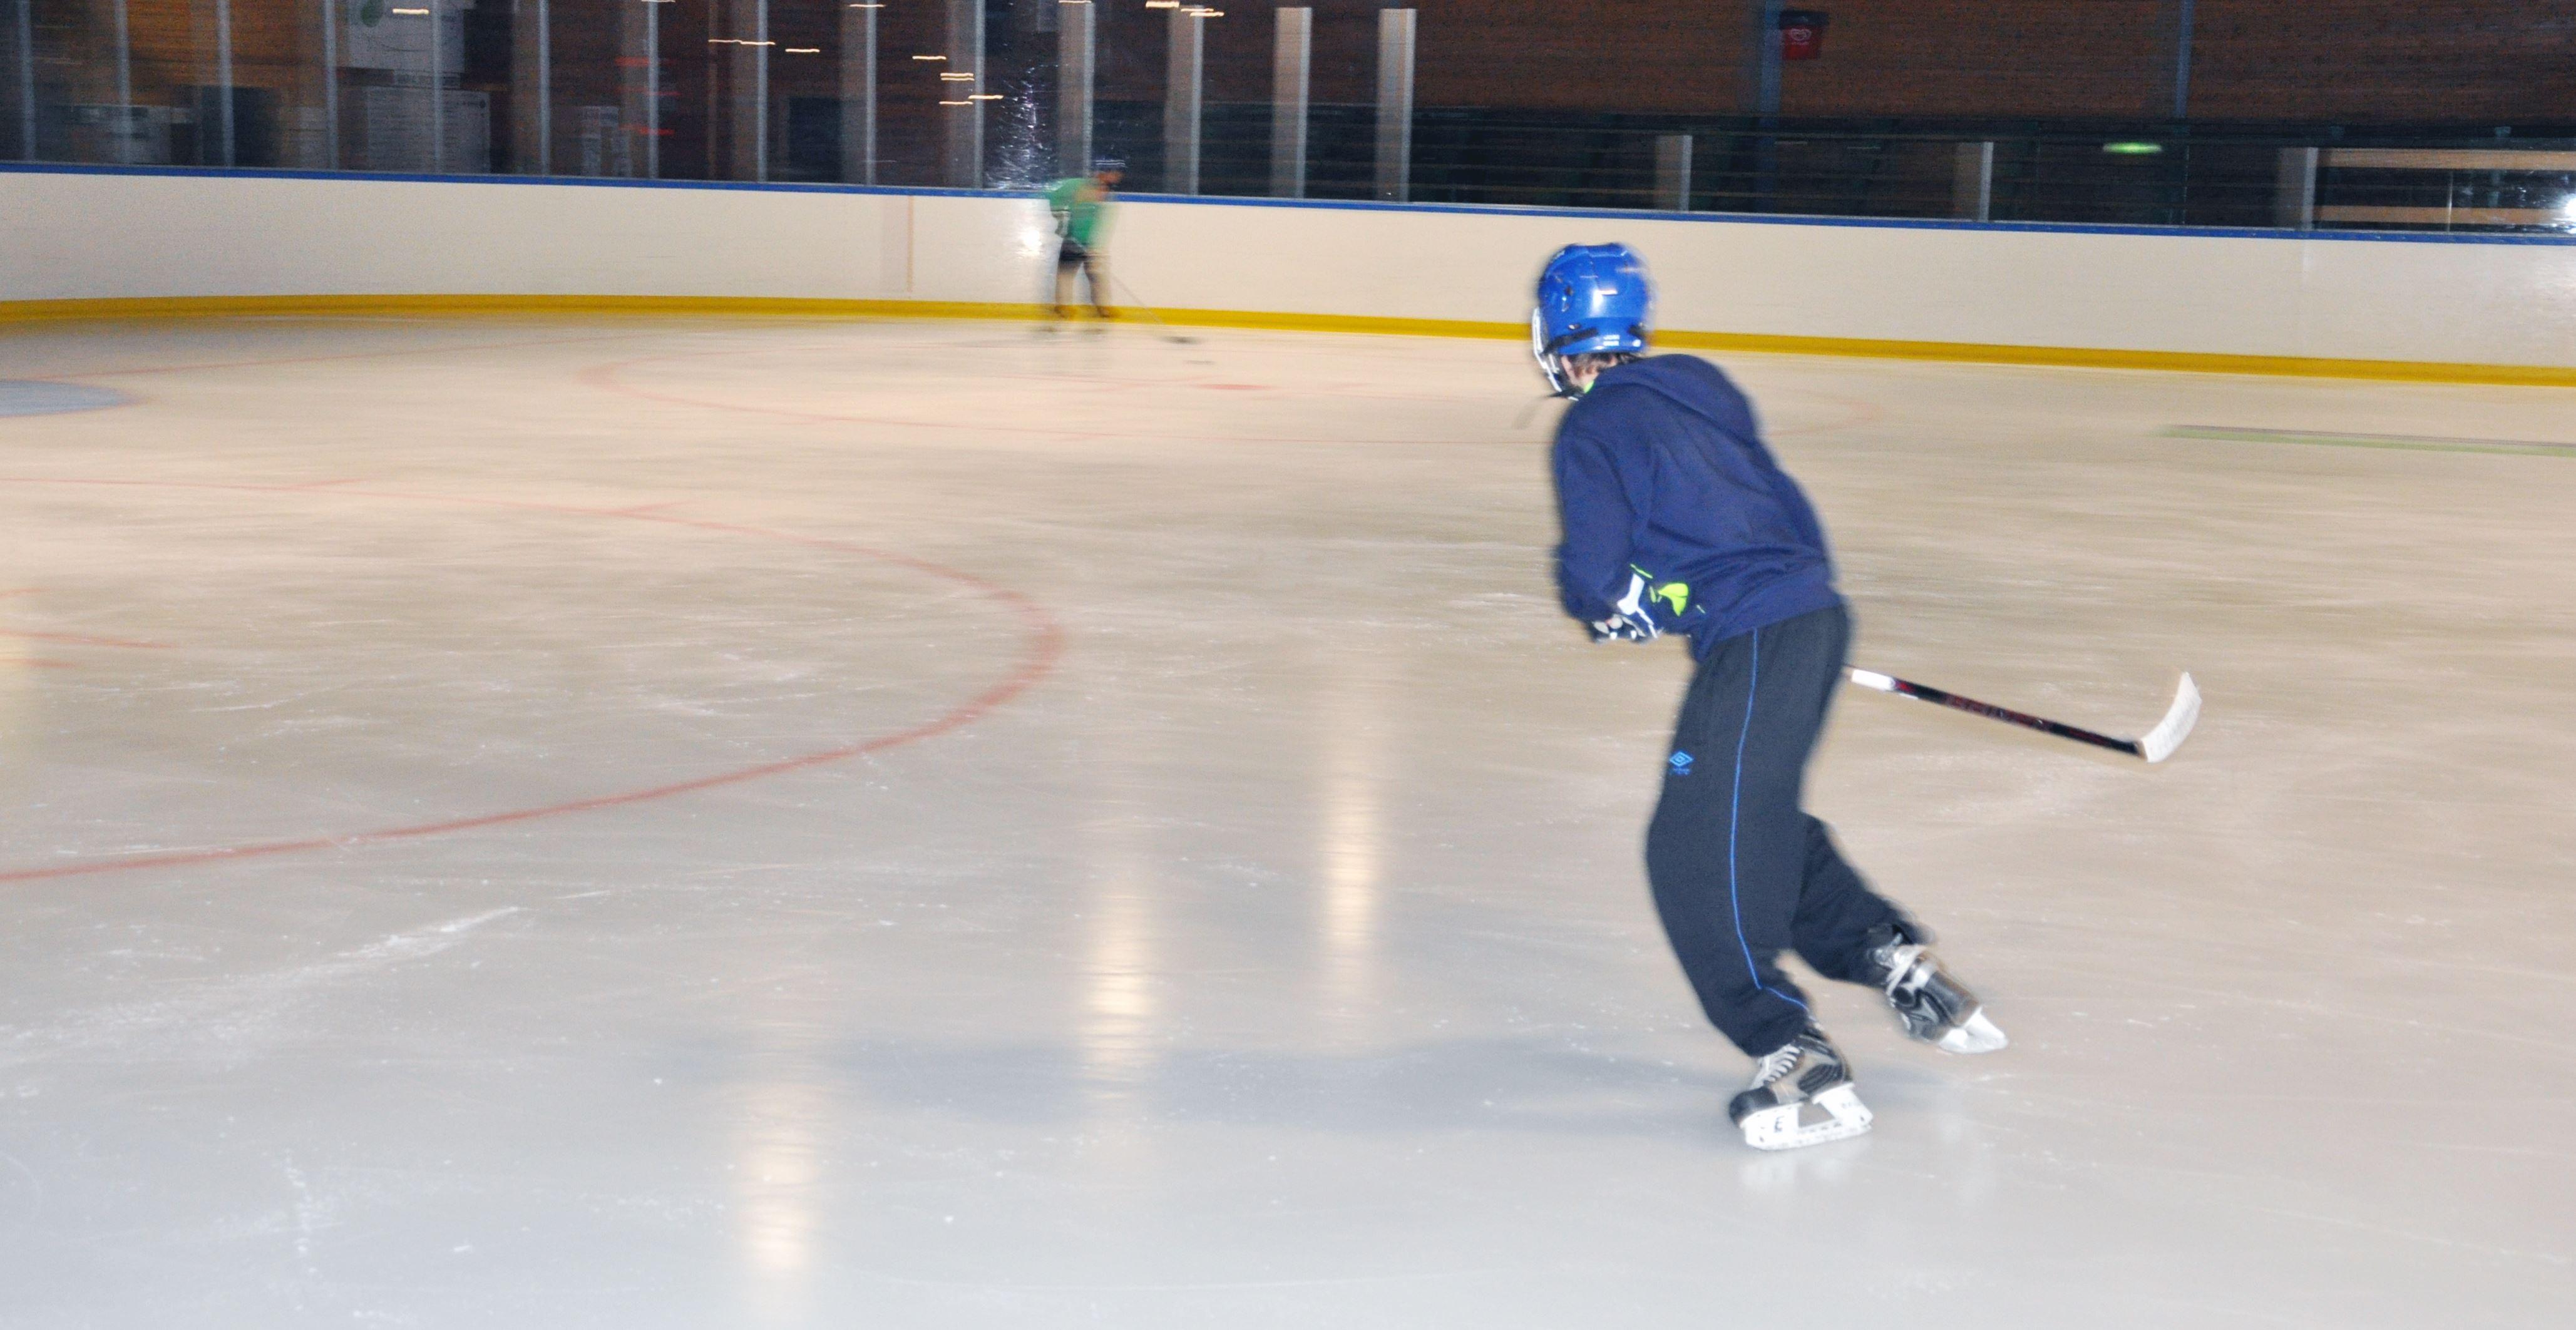 Indoor ice rink, Diö